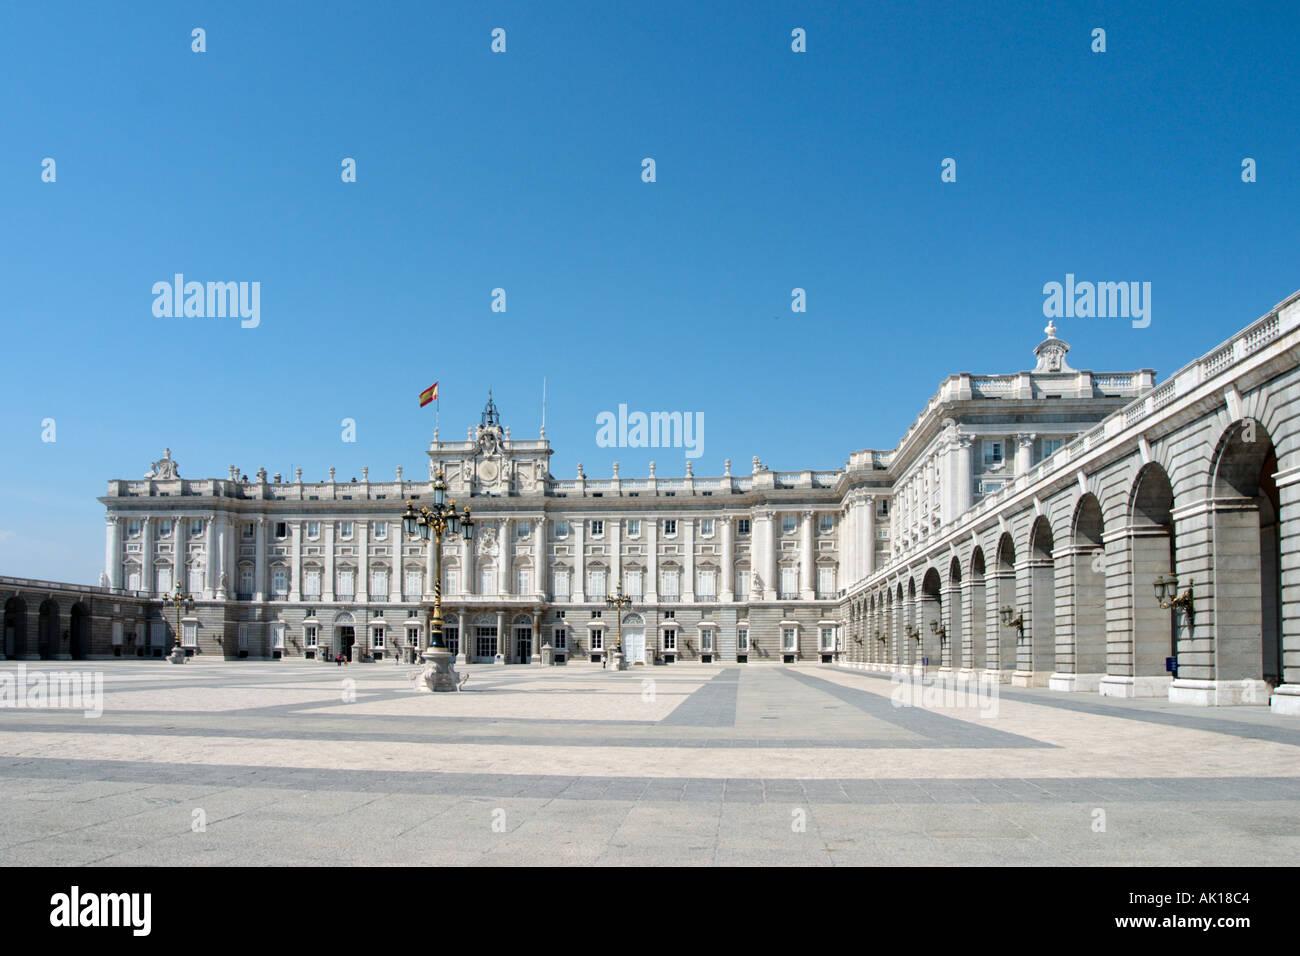 Palacio Real (Royal Palace), Madrid, Spain - Stock Image